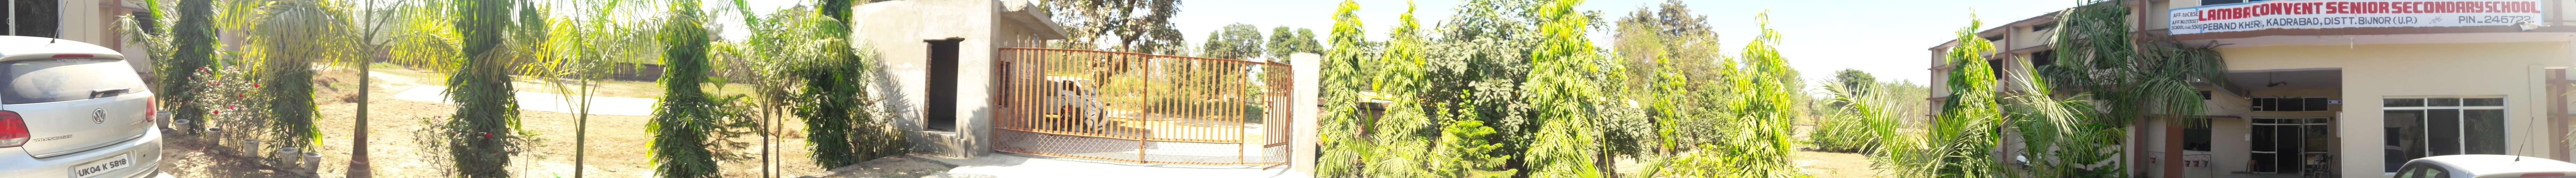 LAMBA CONVENT SCHOOL VILLAGE PEVANDKHERI POST KADRABAD TEHSIL DHAMPUR DISTRICT BIJNOR 2131527